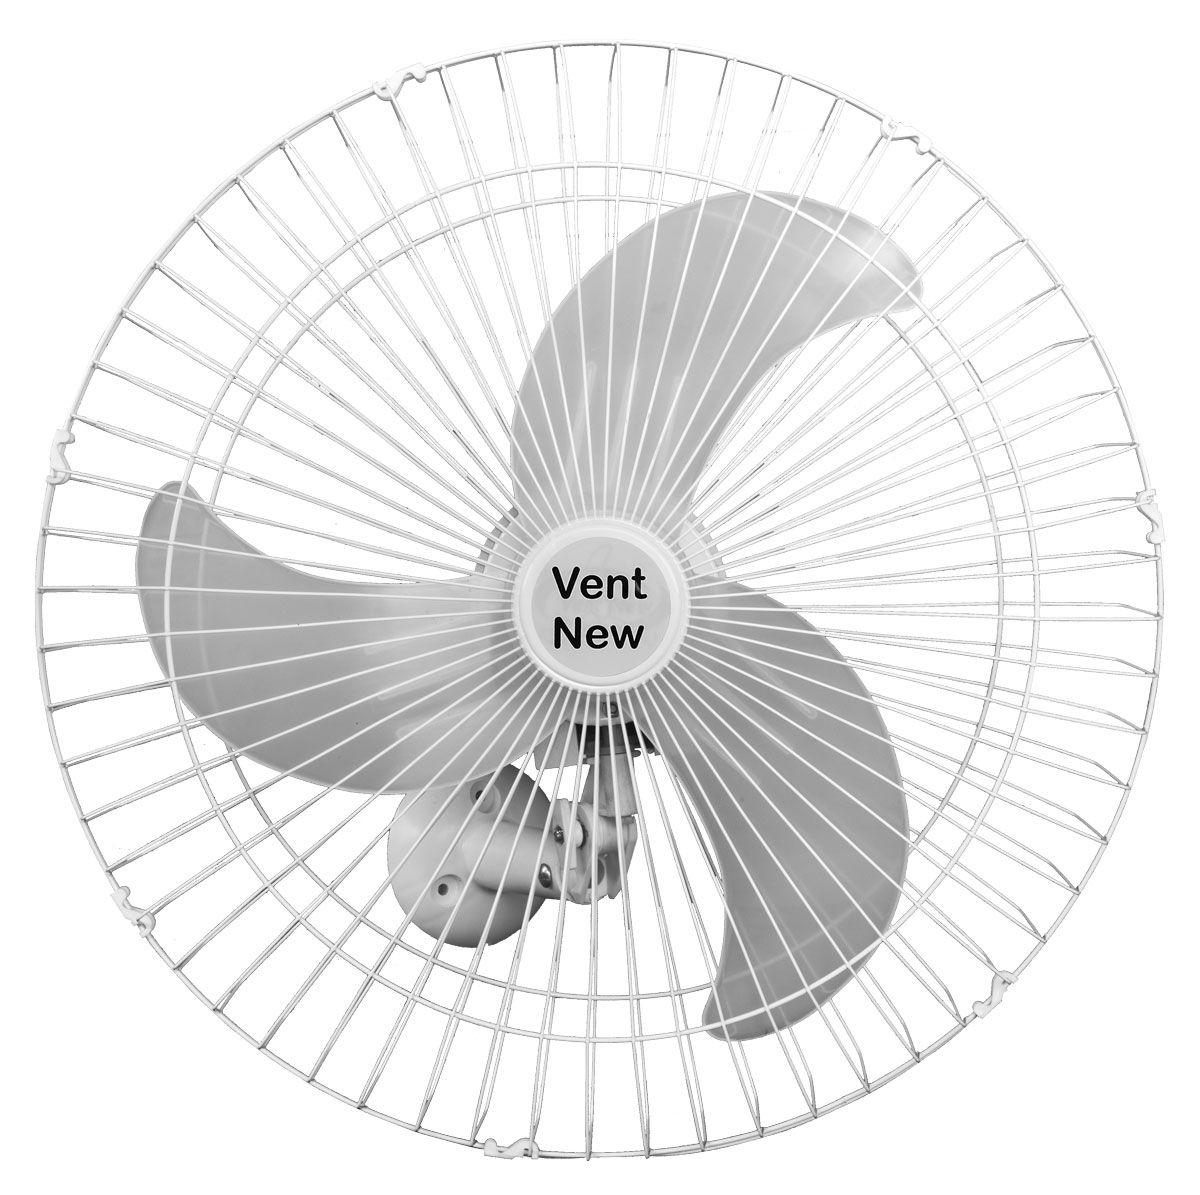 Kit 4 Ventiladores Parede Bivolt Branco Oscilante 60 Cm